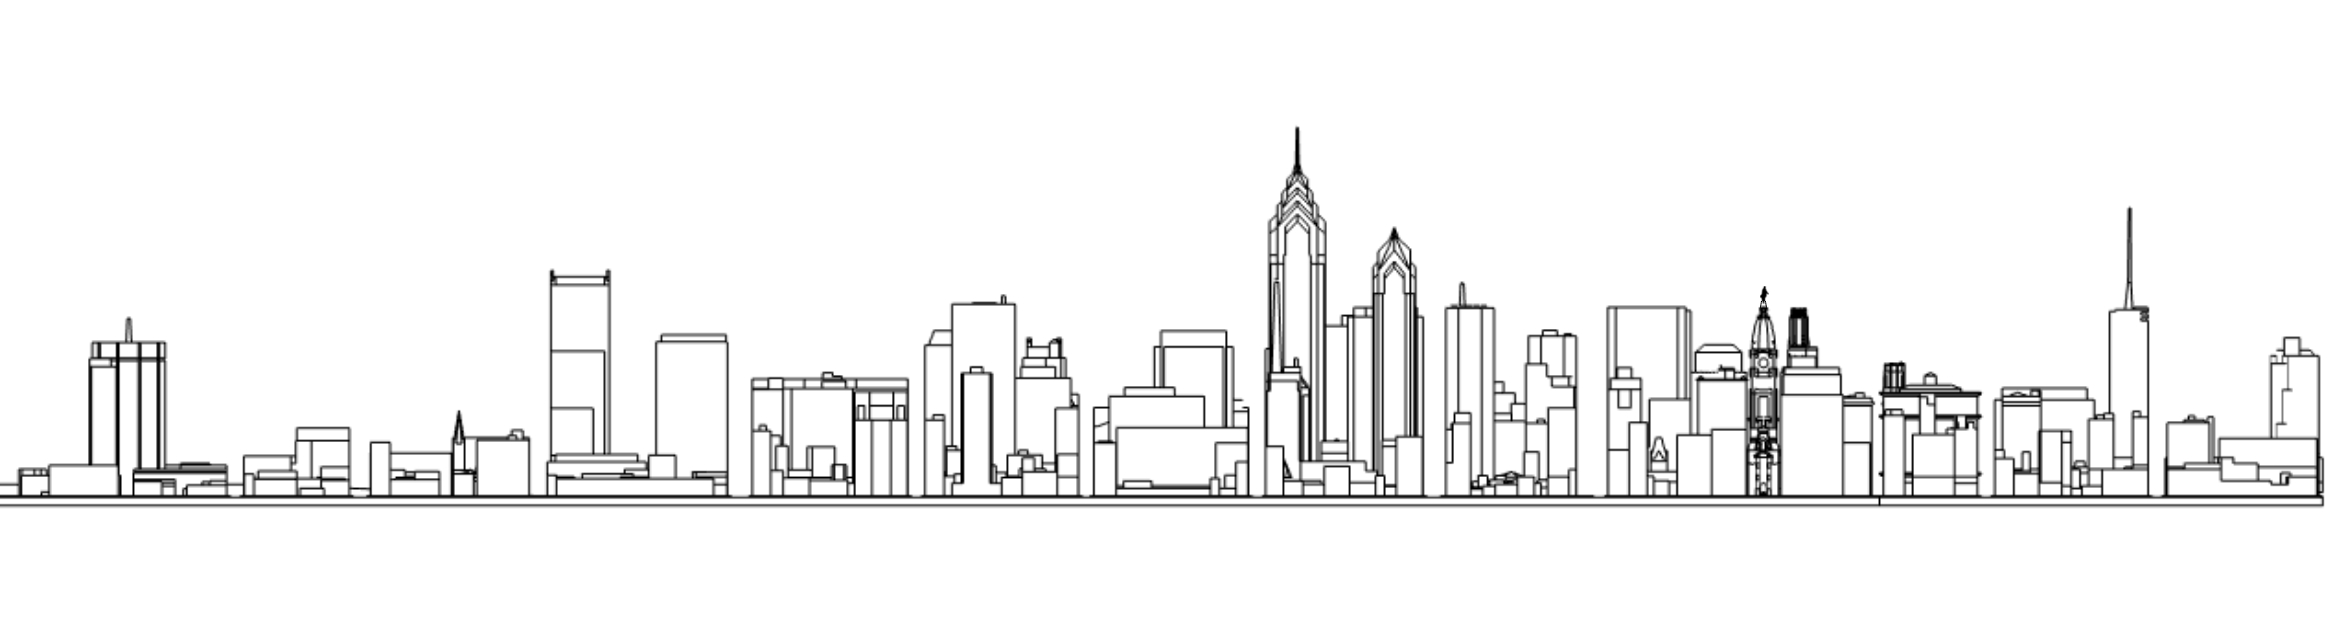 Liberty Place unfinished design with the Philadelphia skyline, south elevation. Models and image by Thomas Koloski